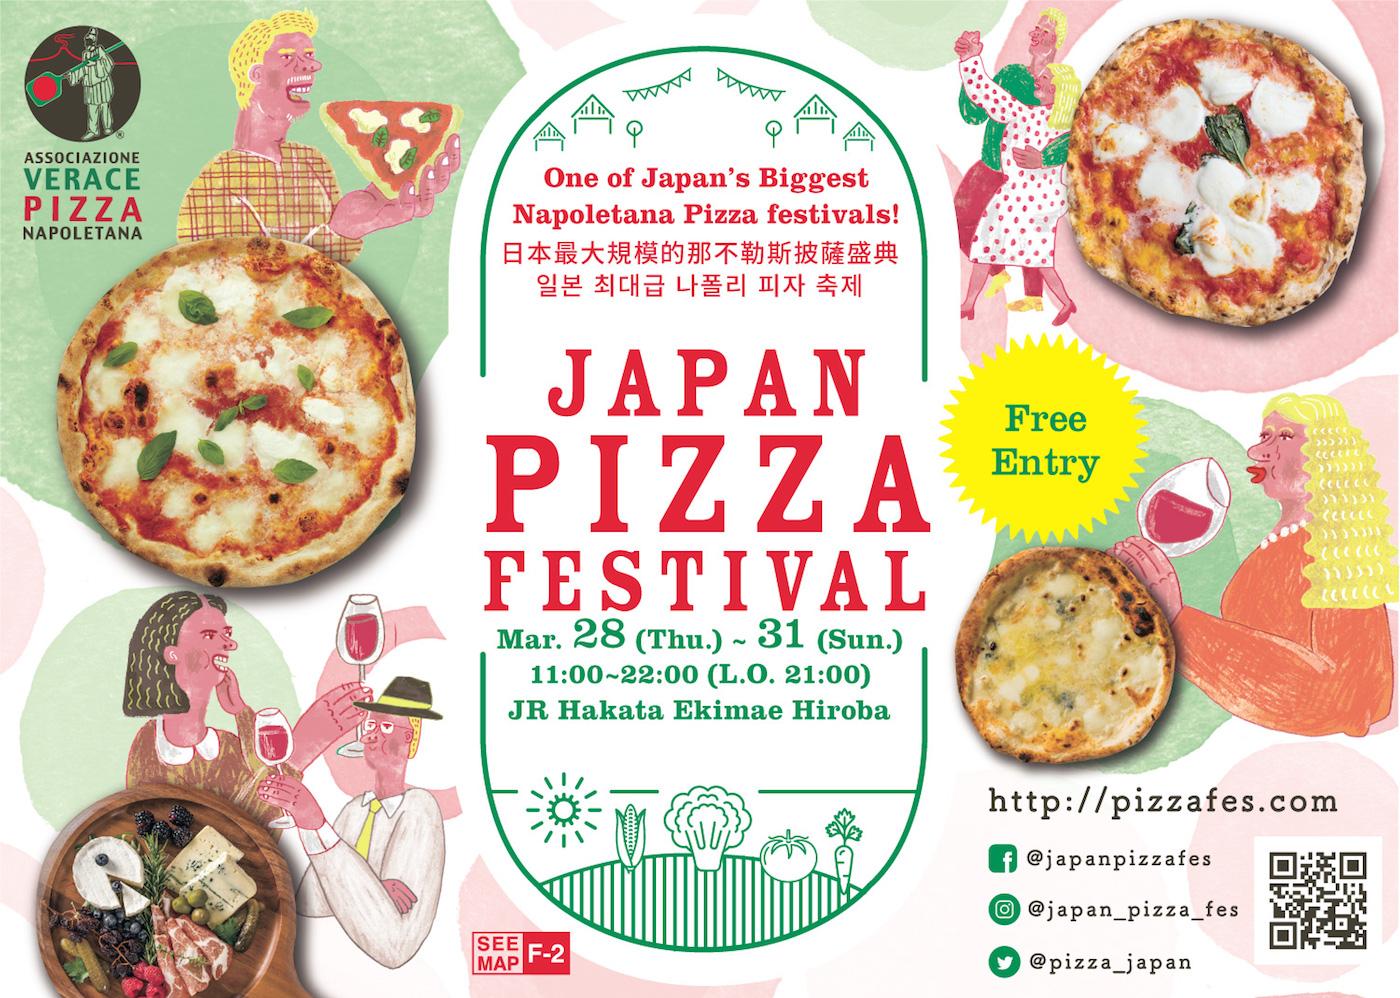 pizza, napoletana, neapolitan, italian, japan